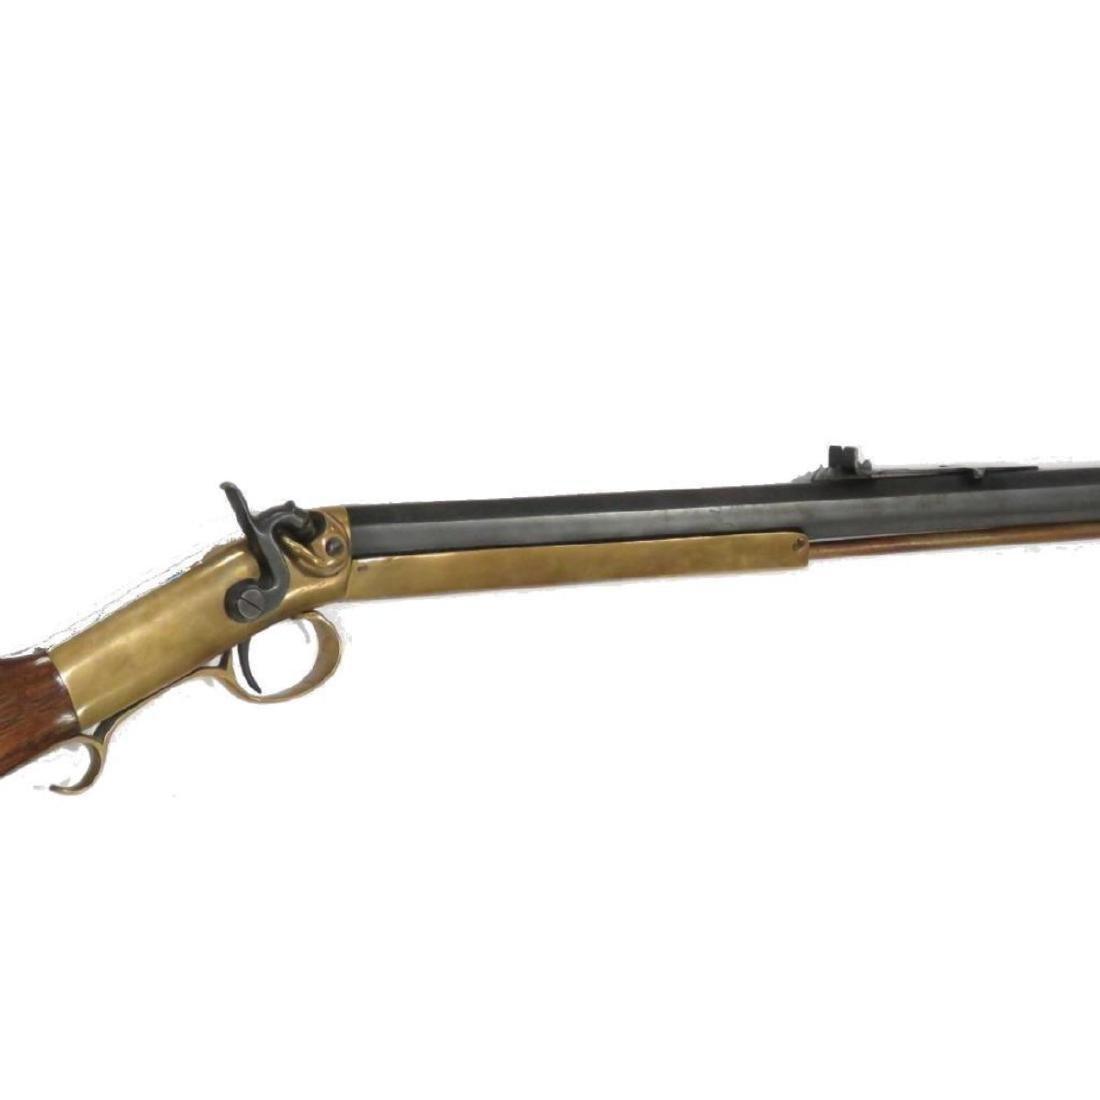 1850's Mowrey .58 Cal Black Powder Percussion Musket - 2